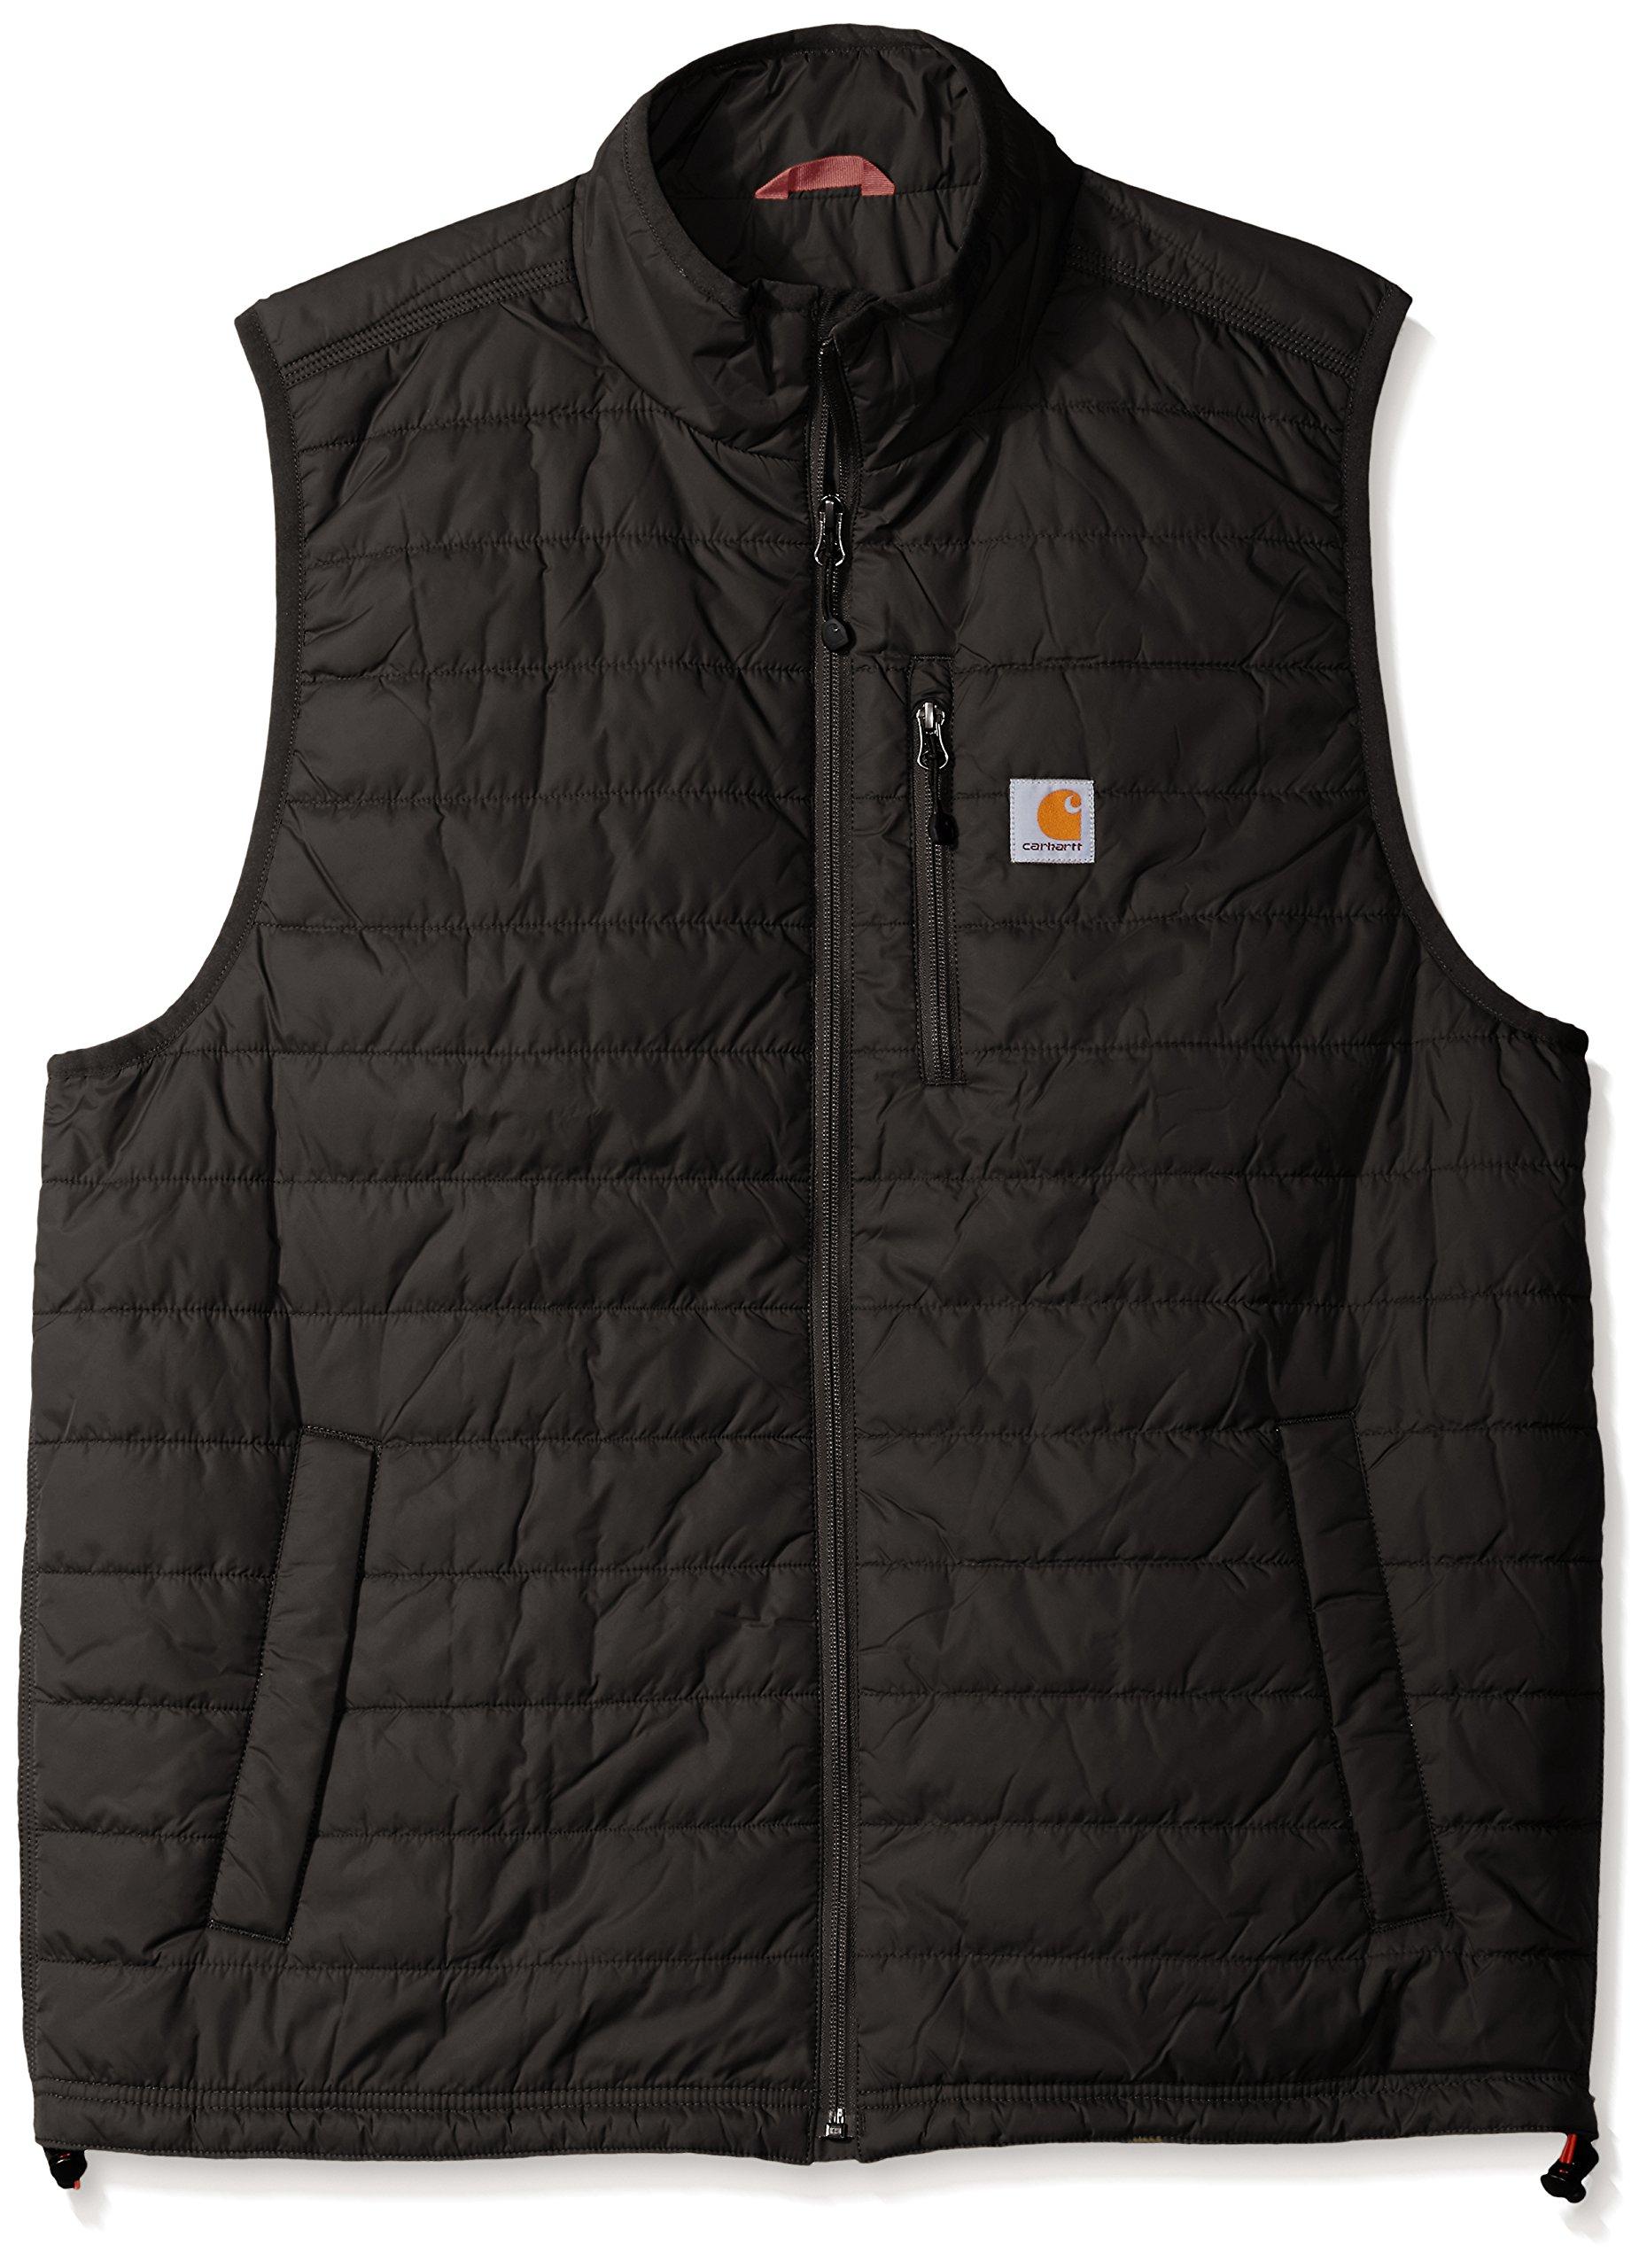 Carhartt Men's Big & Tall Gilliam Vest, Black, 3X-Large by Carhartt